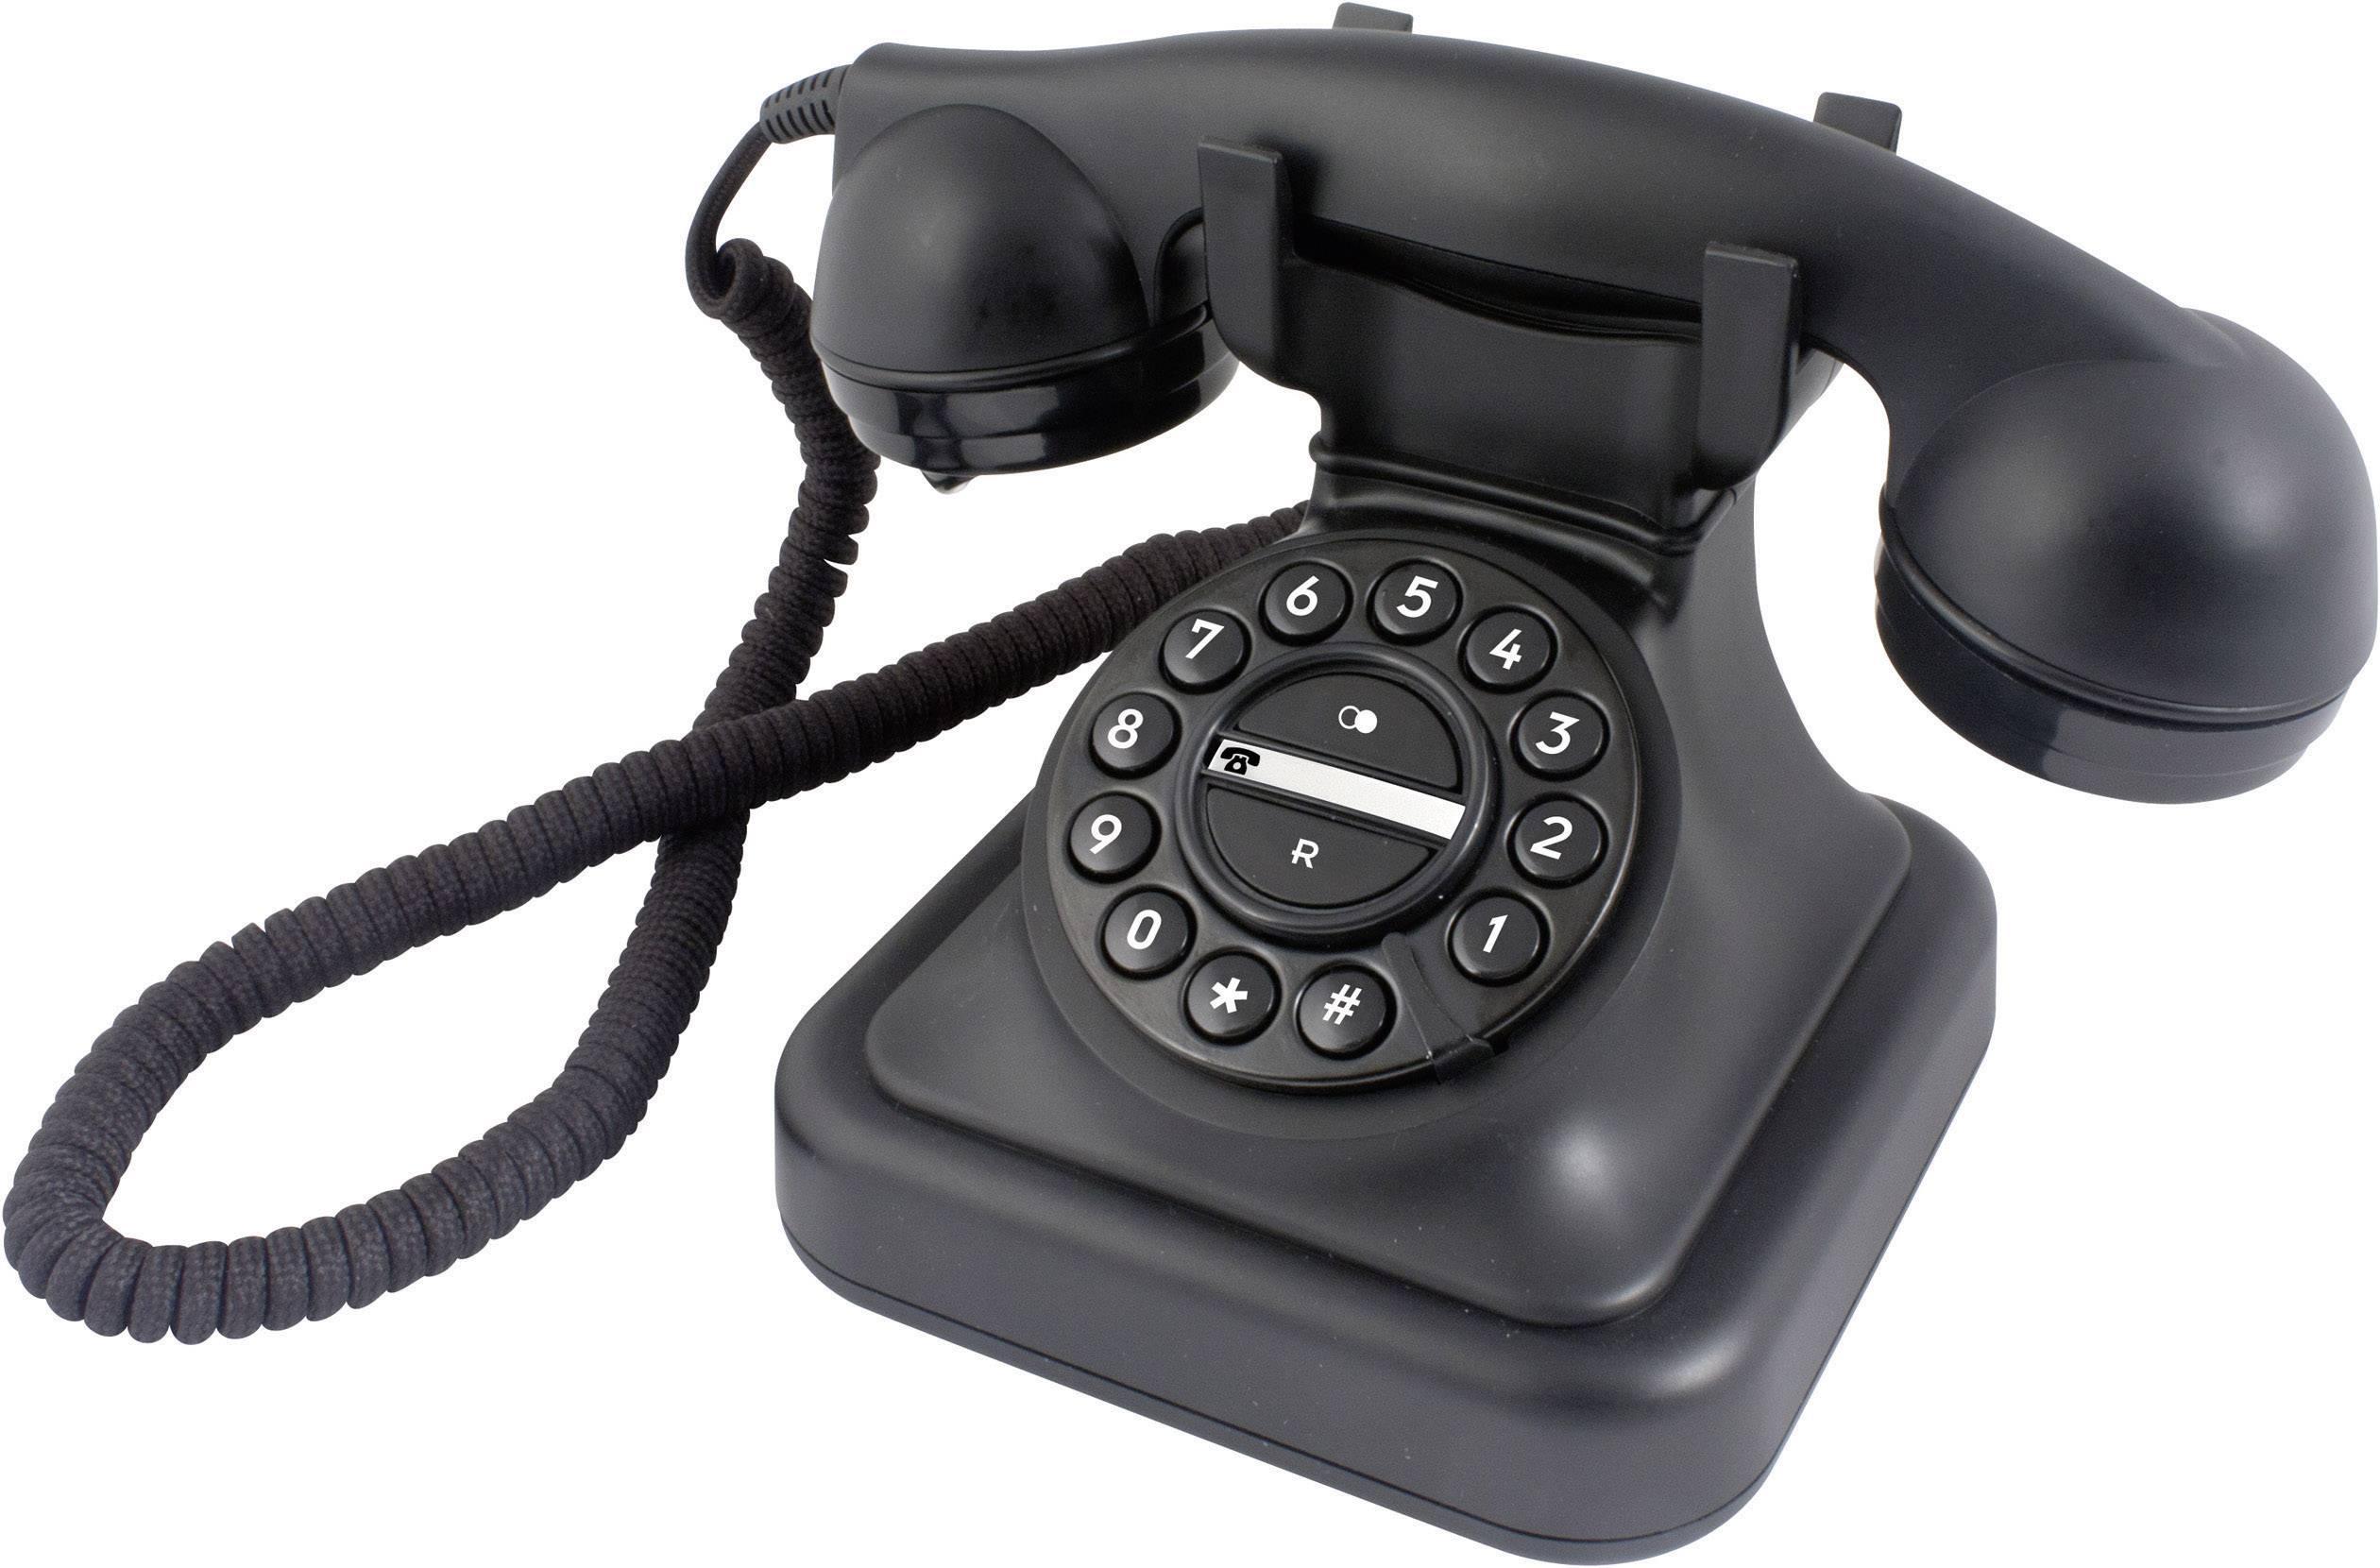 Telefoonnummer Wapwinkel